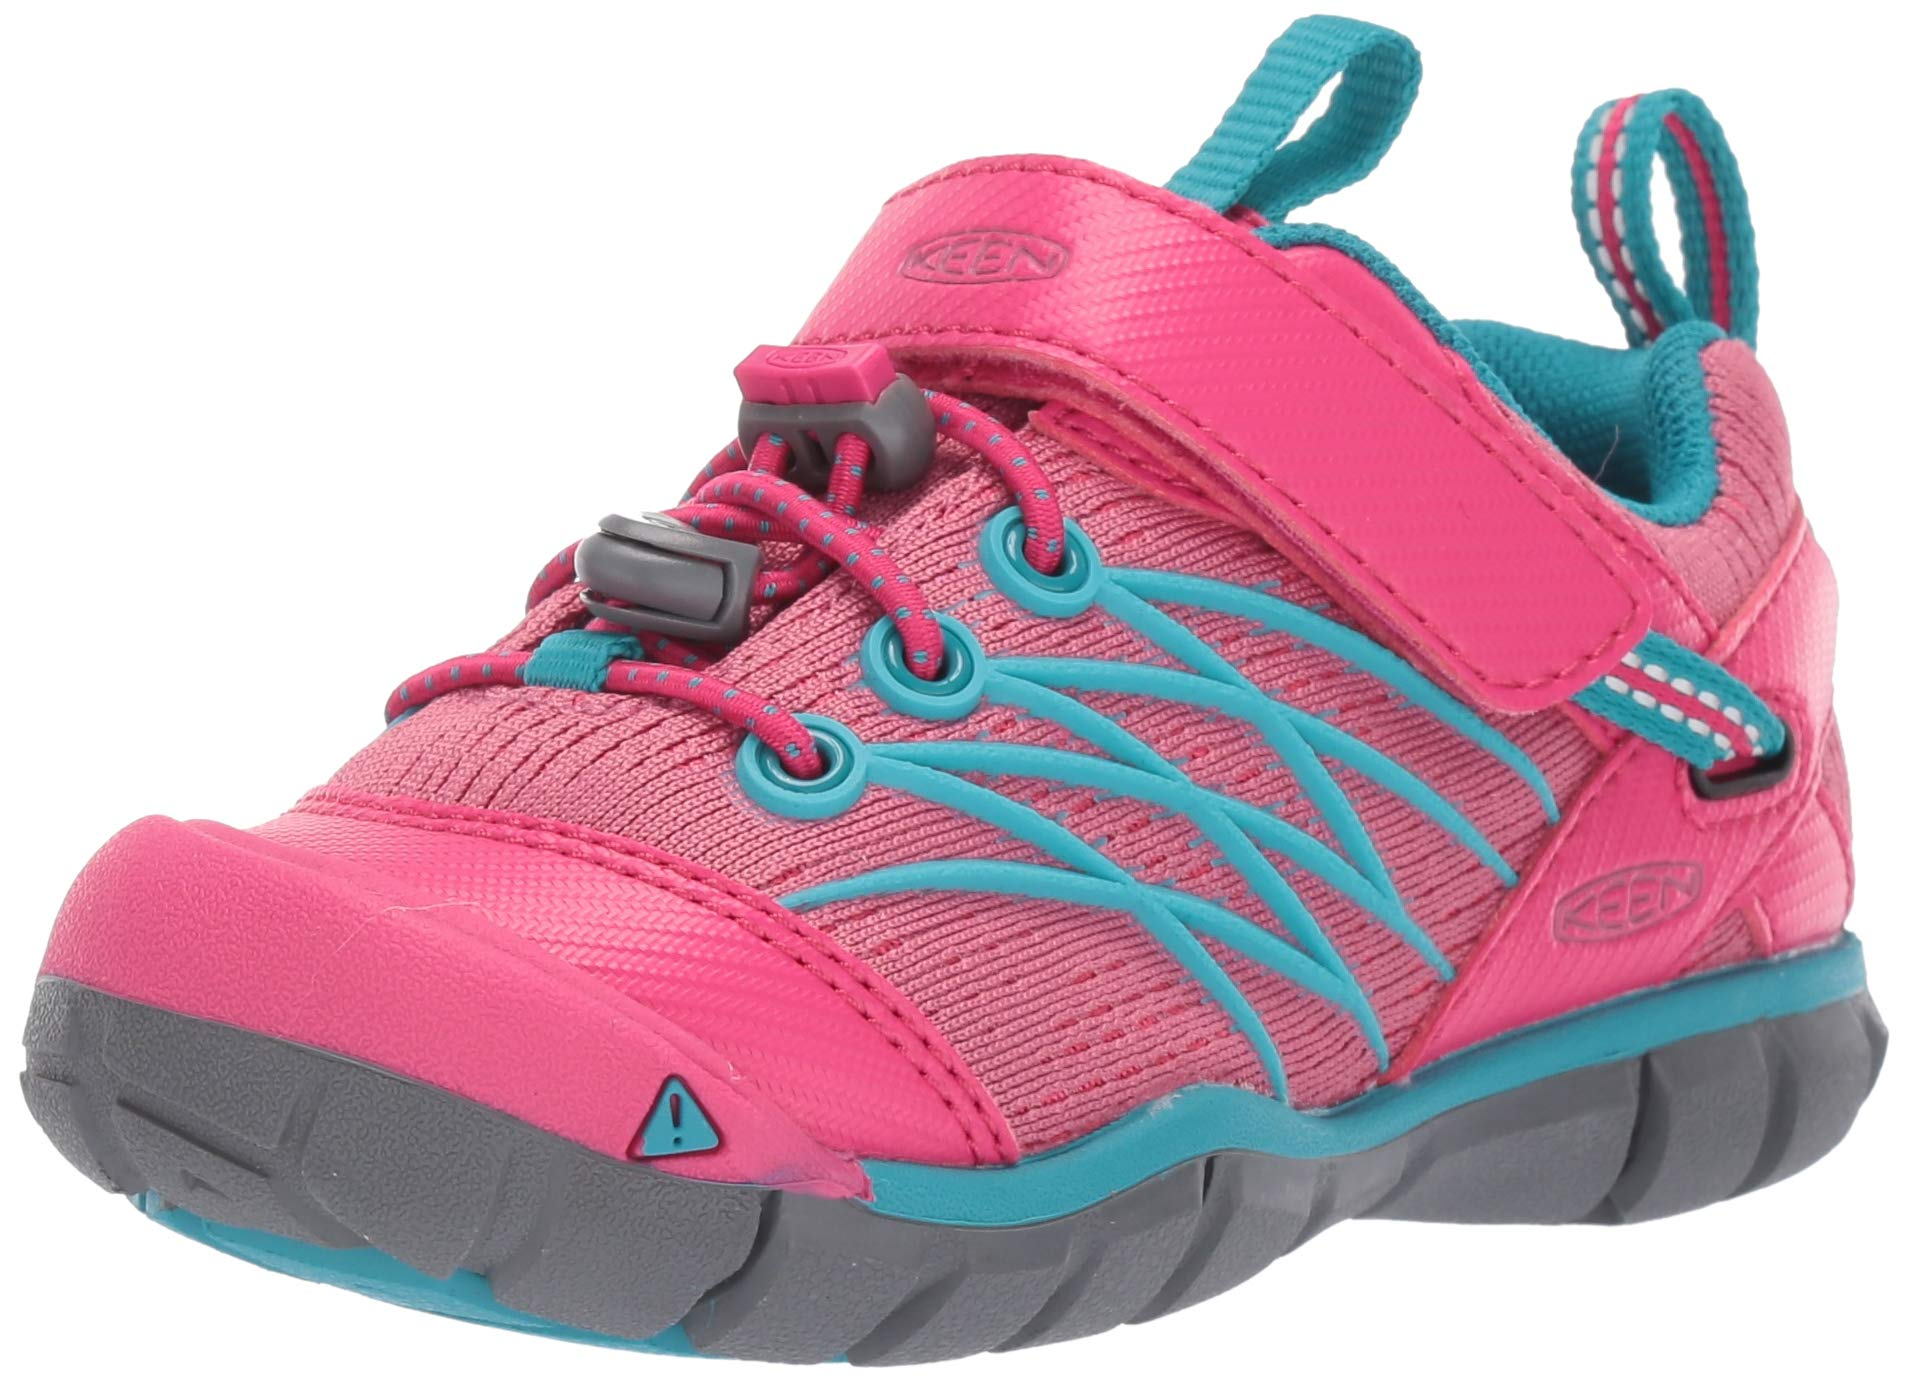 Keen Unisex Chandler CNX Hiking Shoe, Bright Pink/Lake Green, 10 M US Little Kid